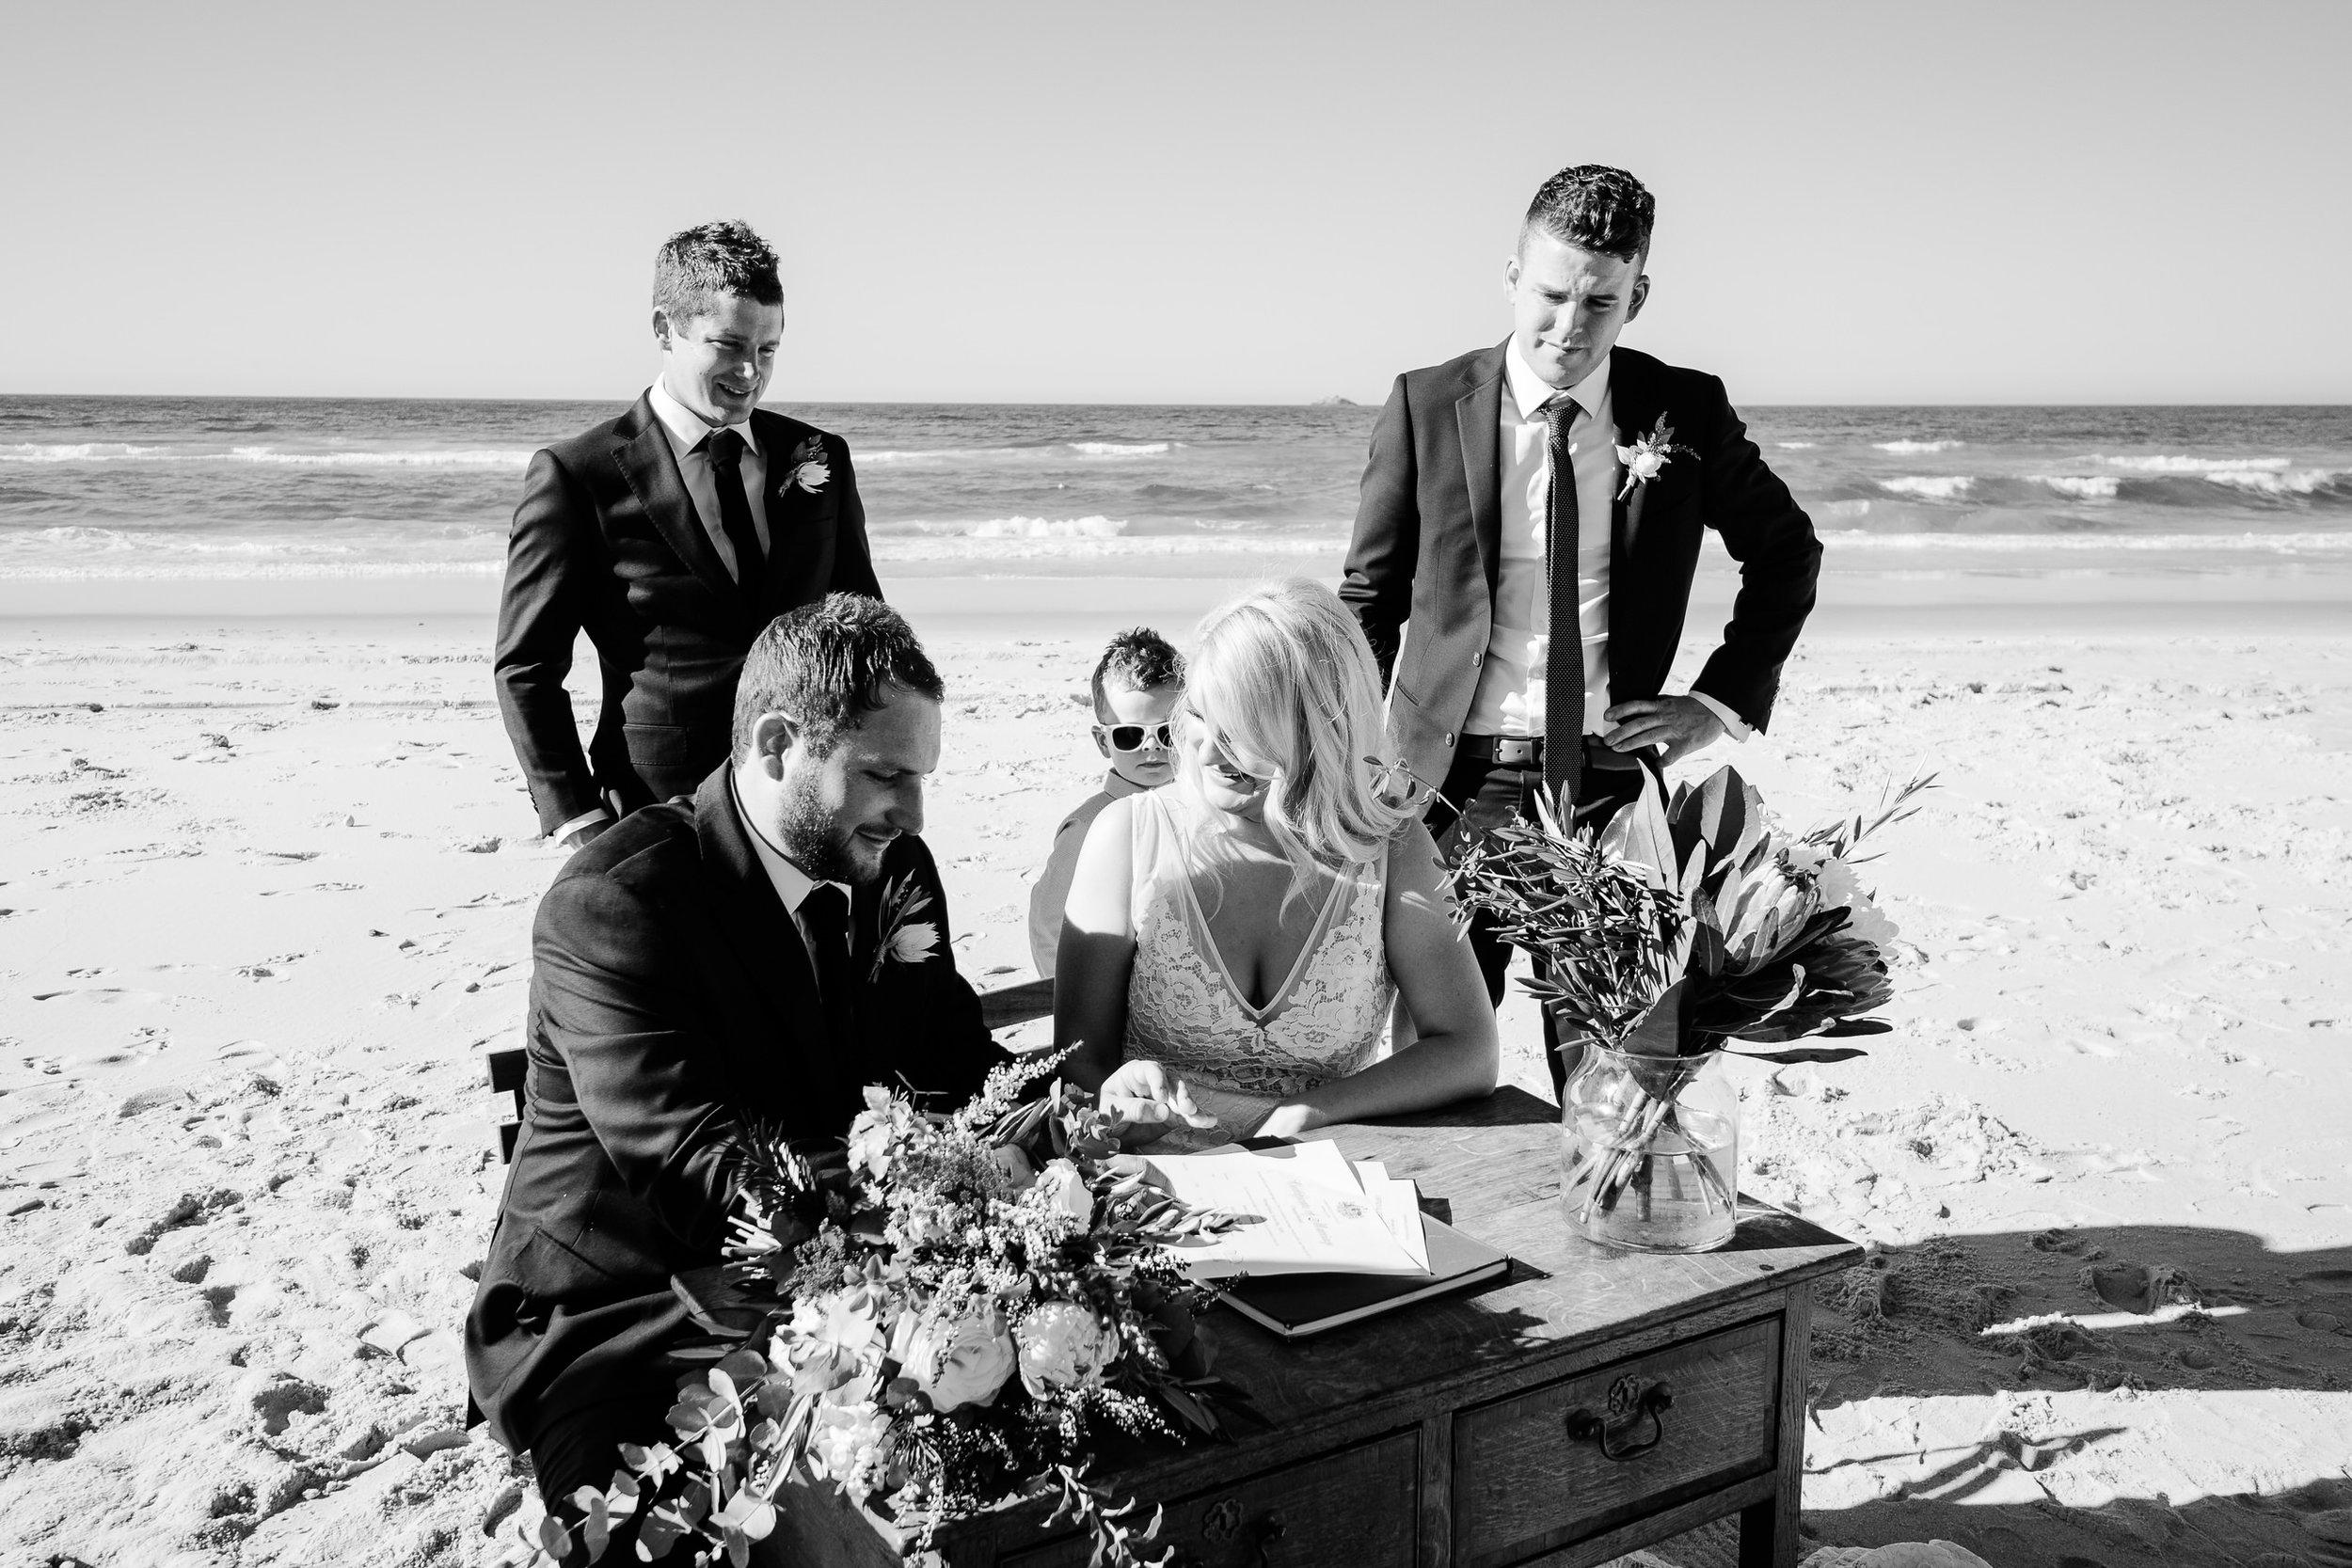 Justin_And_Jim_Photography_Byron_Bay_Wedding056.JPG